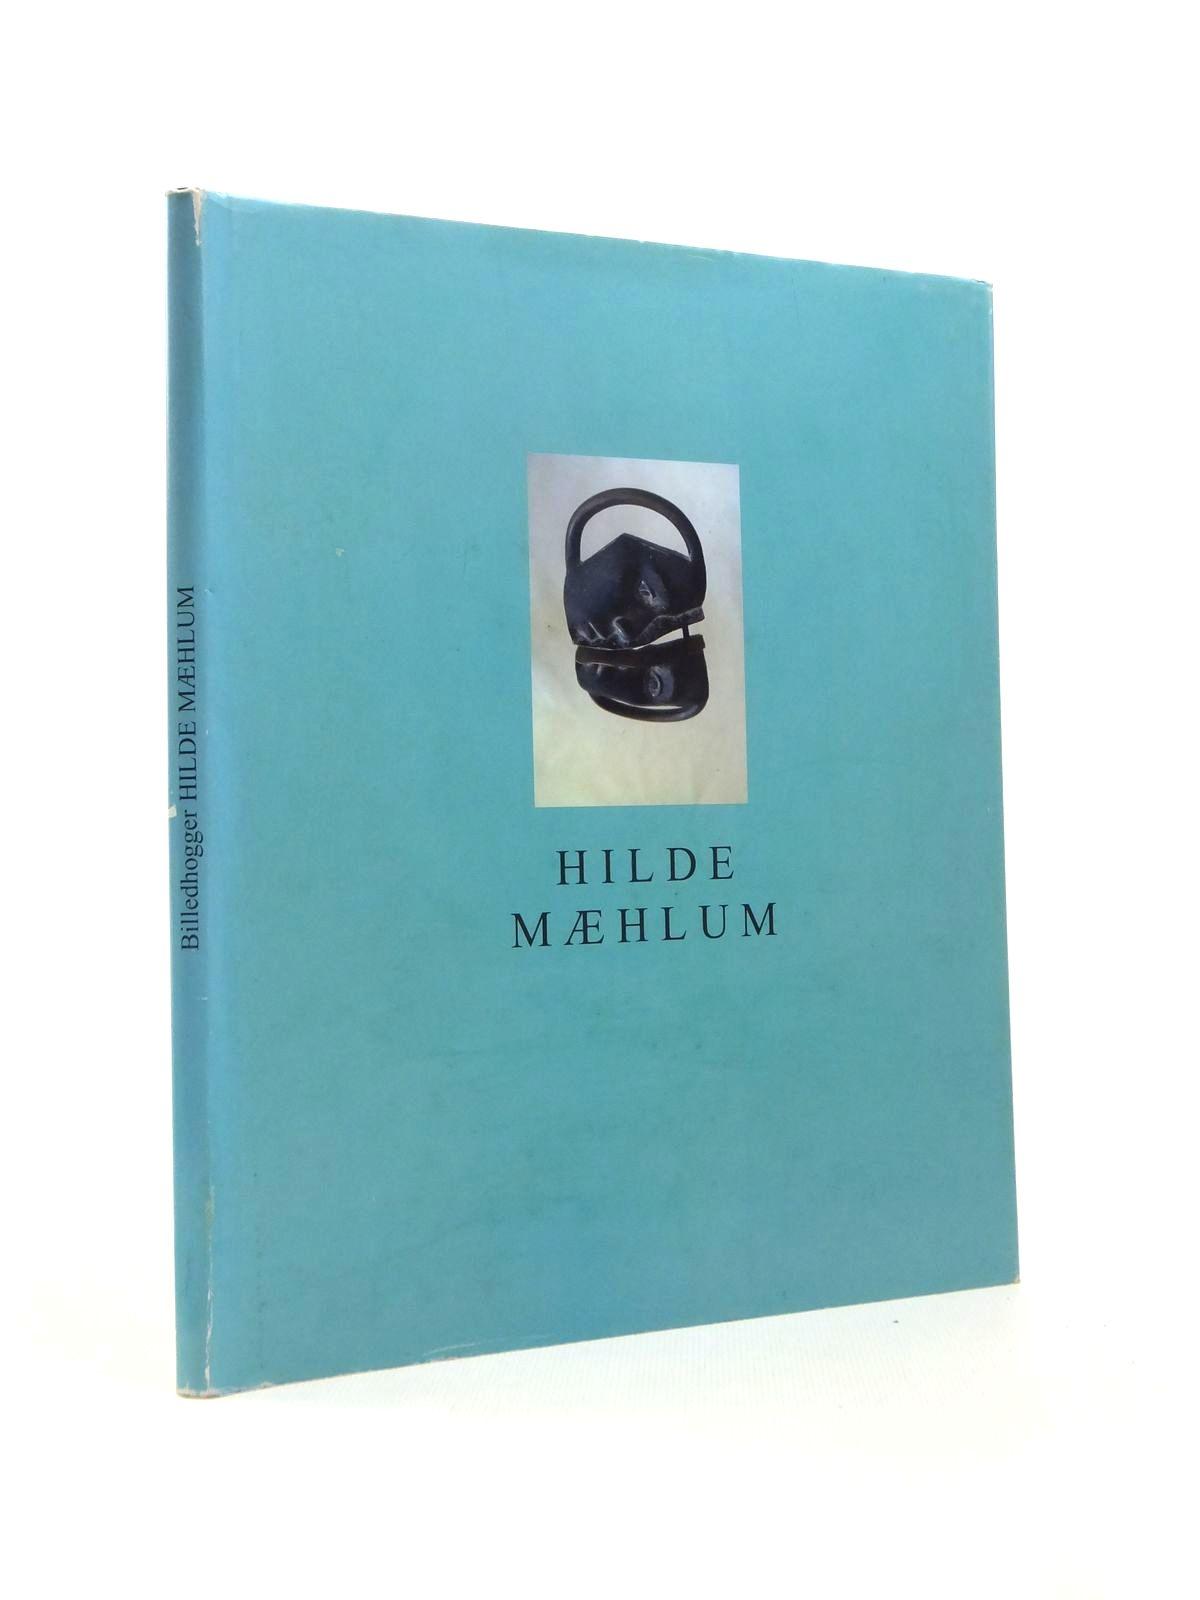 Photo of BILLEDHOGGER HILDE MAEHLUM- Stock Number: 1208581